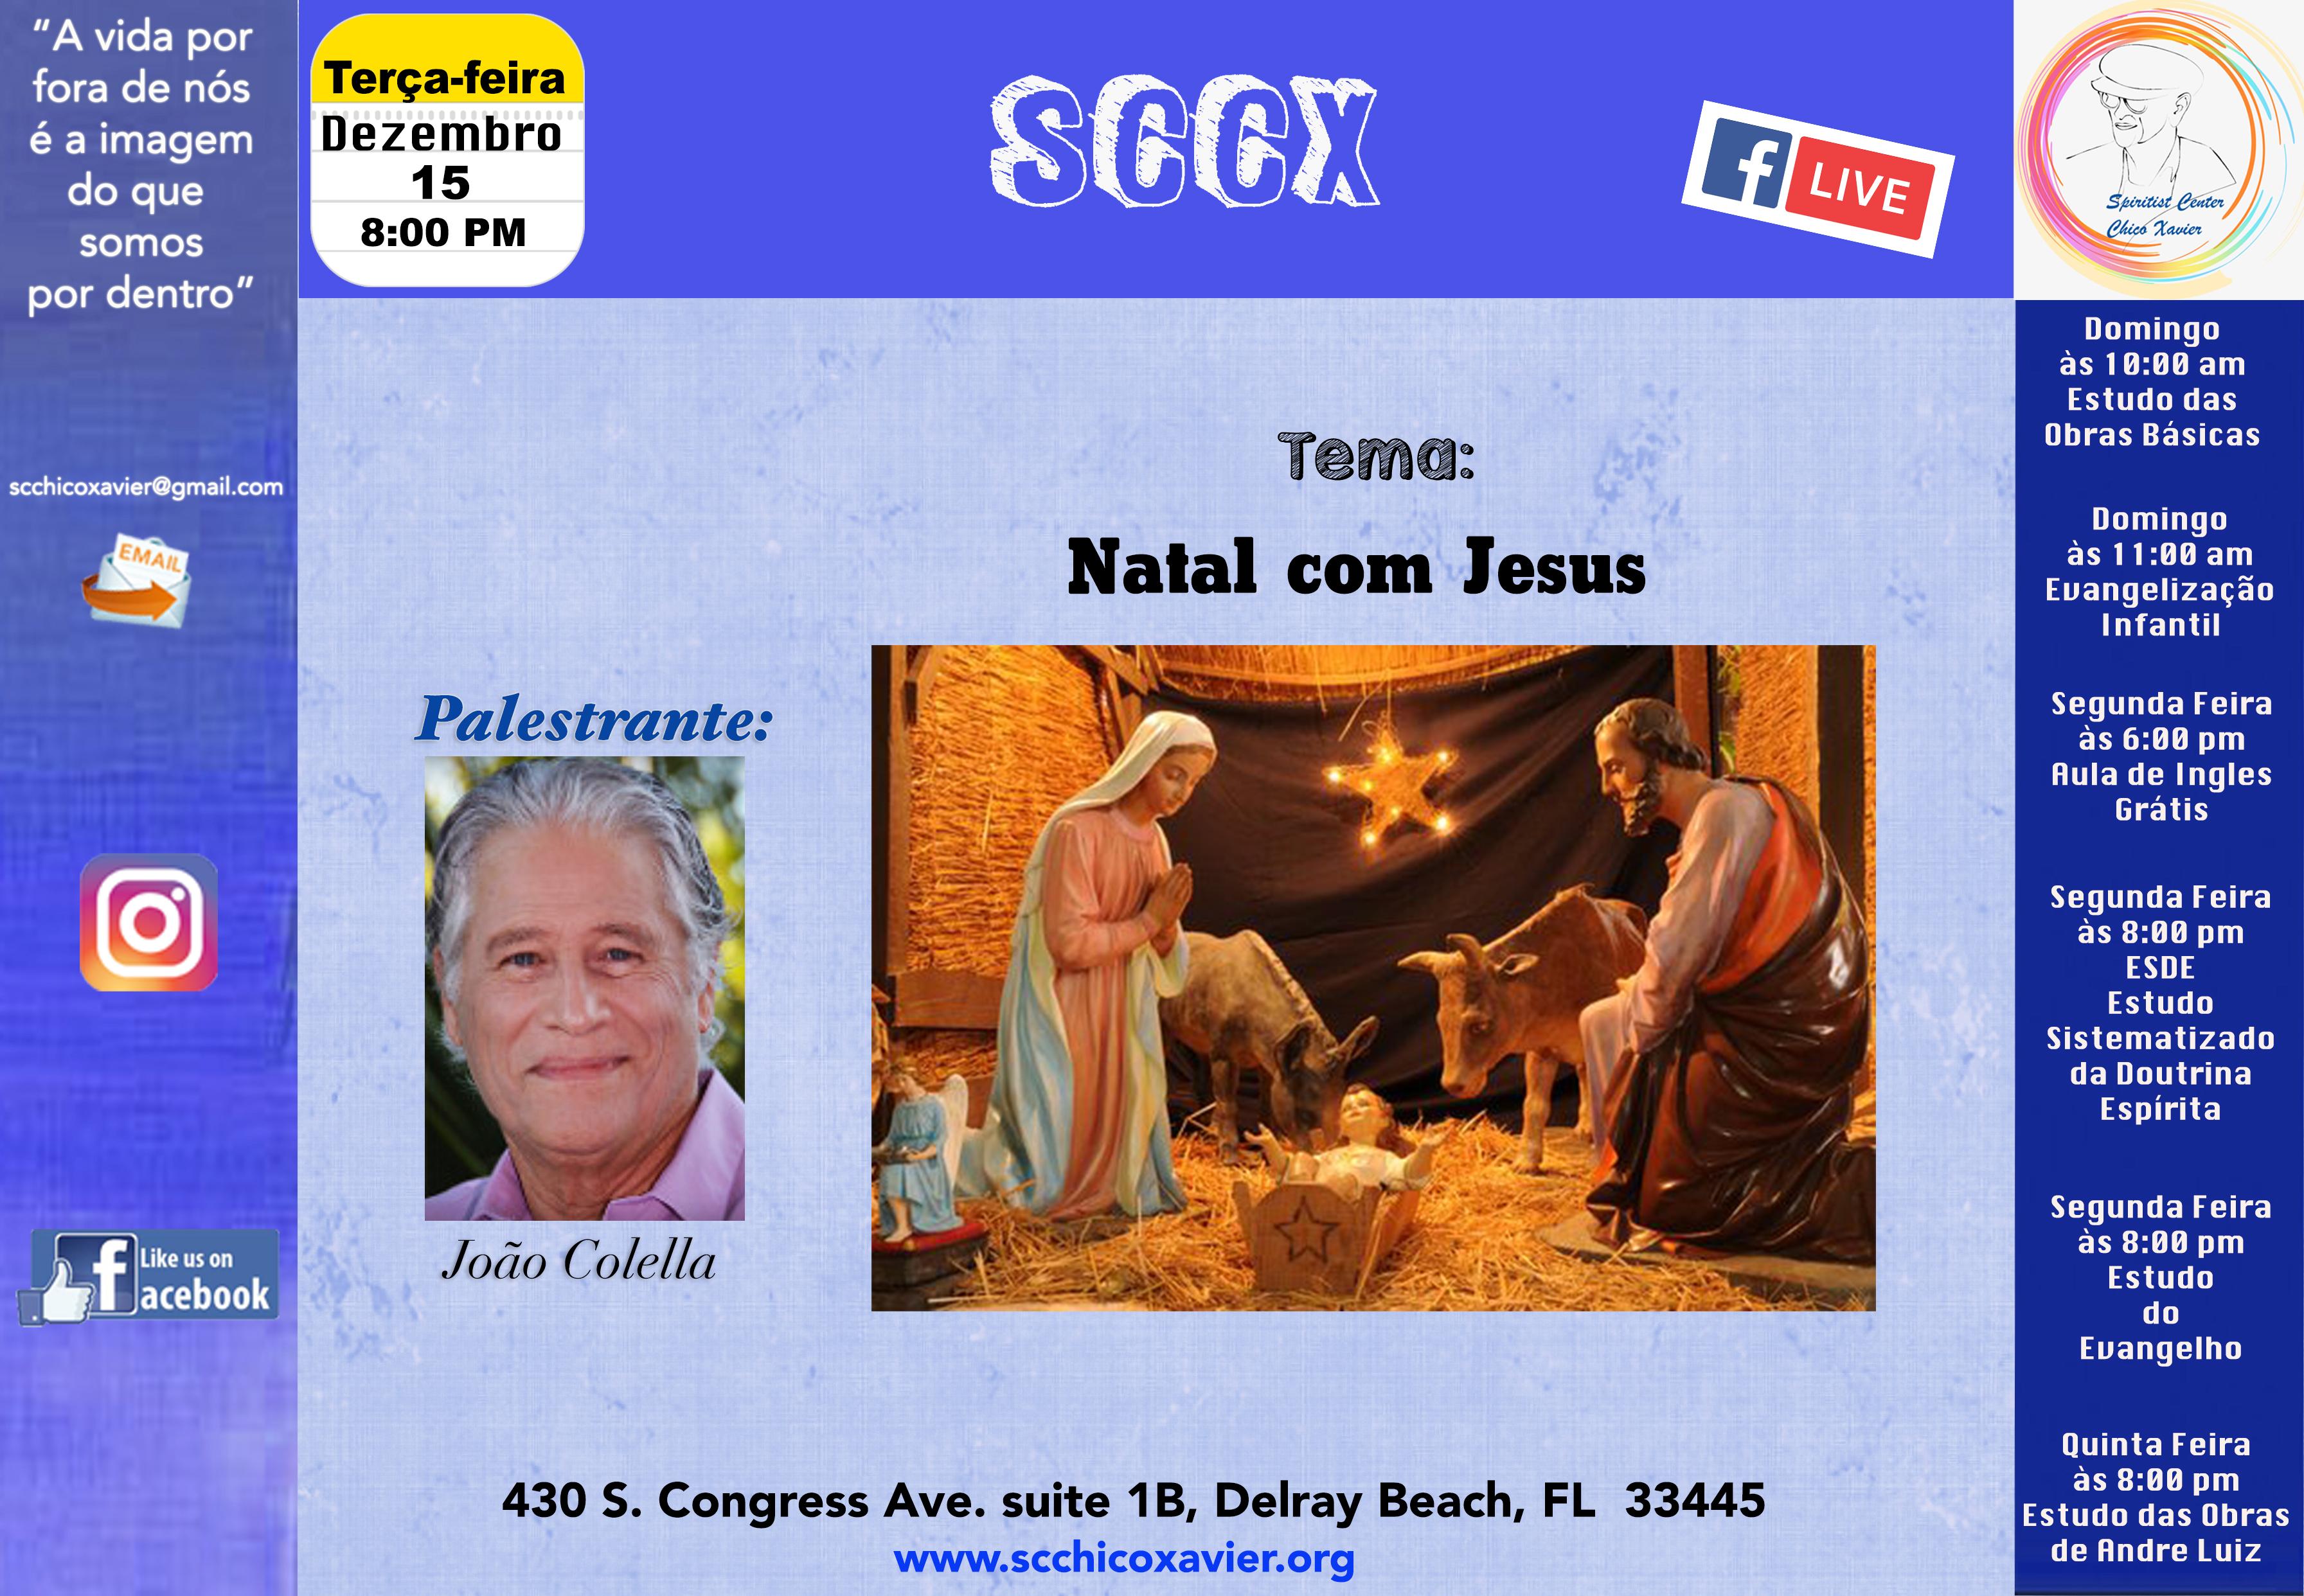 João Colella - Natal com Jesus